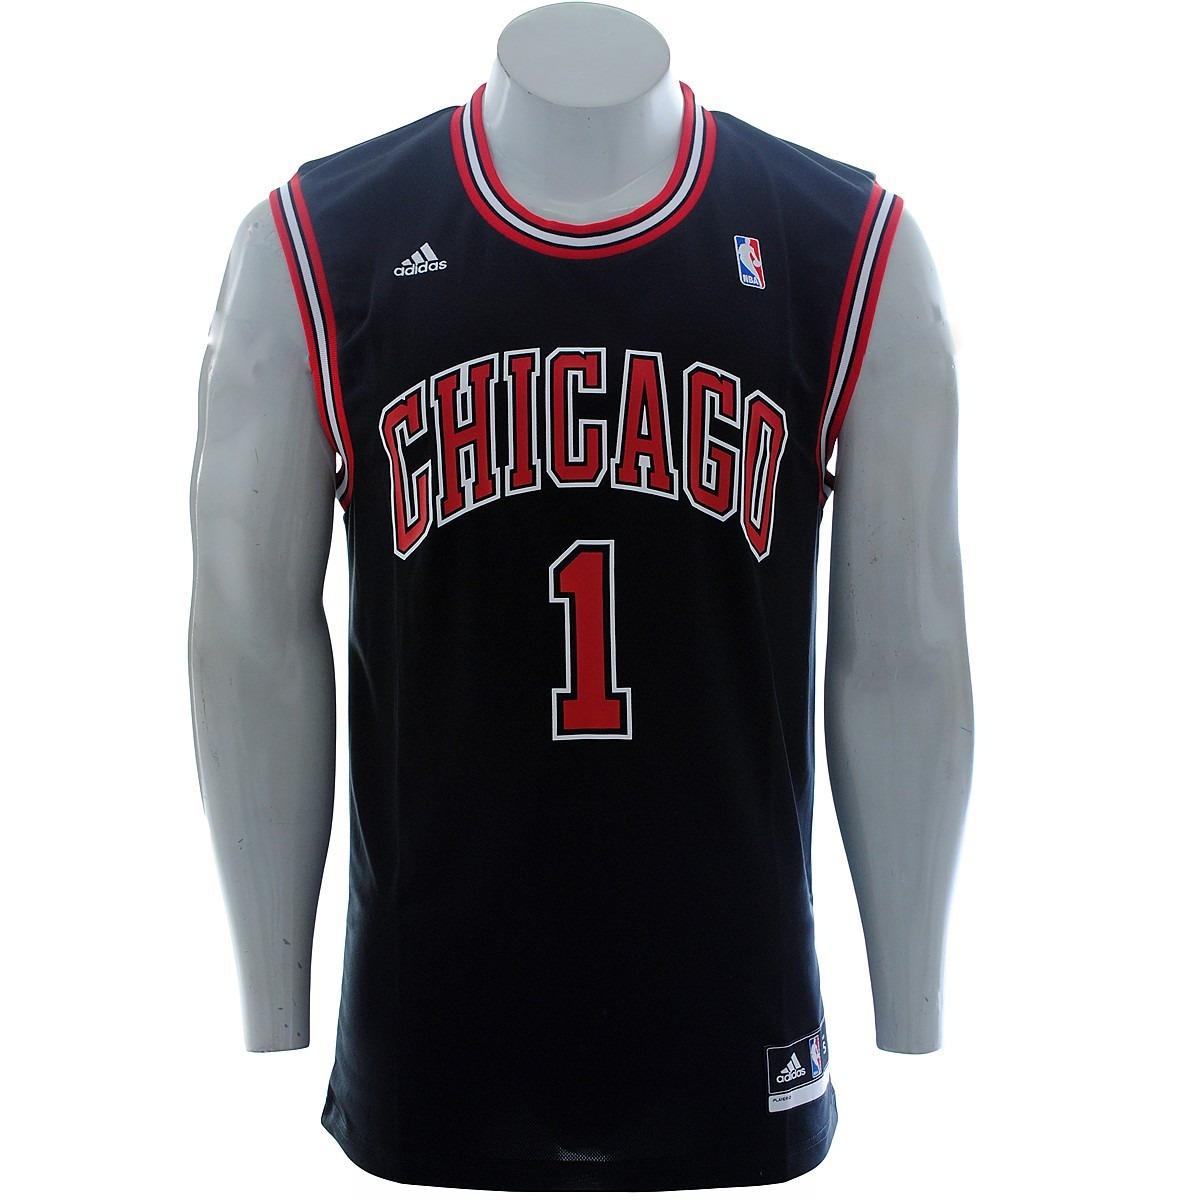 [Vargem Grande] Sítio Rio Verde - Página 2 Camisa-basquete-nba-regata-times-miami-chicago-lakers-D_NQ_NP_352601-MLB20346549163_072015-F